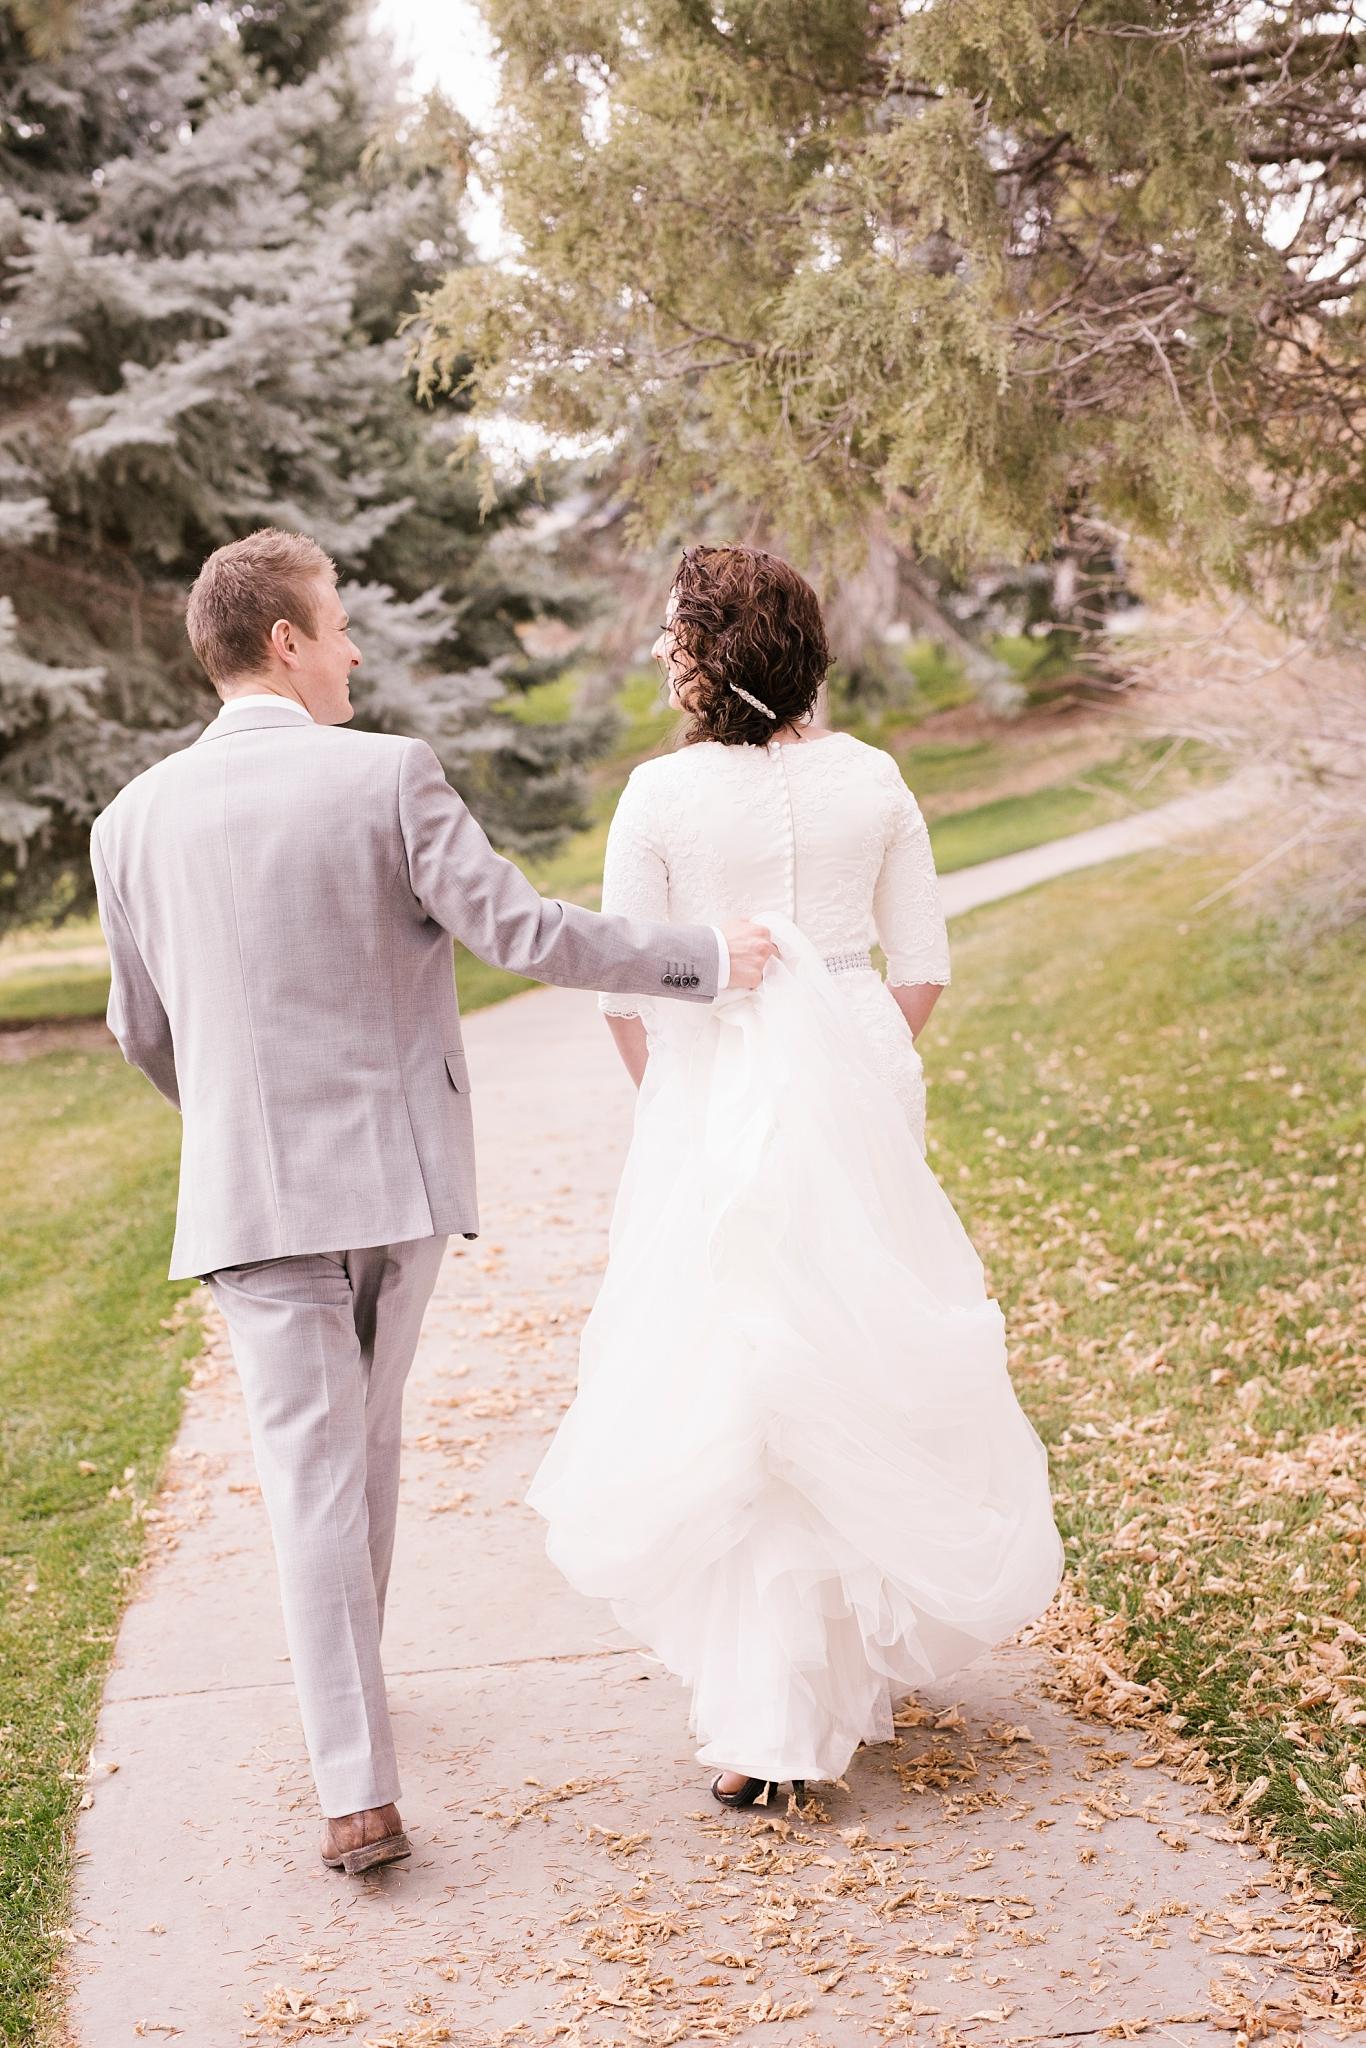 BA-Bridals-46_Lizzie-B-Imagery-Utah-Wedding-Photographer-Engagement-Photography-Salt-Lake-City-Park-City-Utah-County-Manti-Utah-Temple.jpg